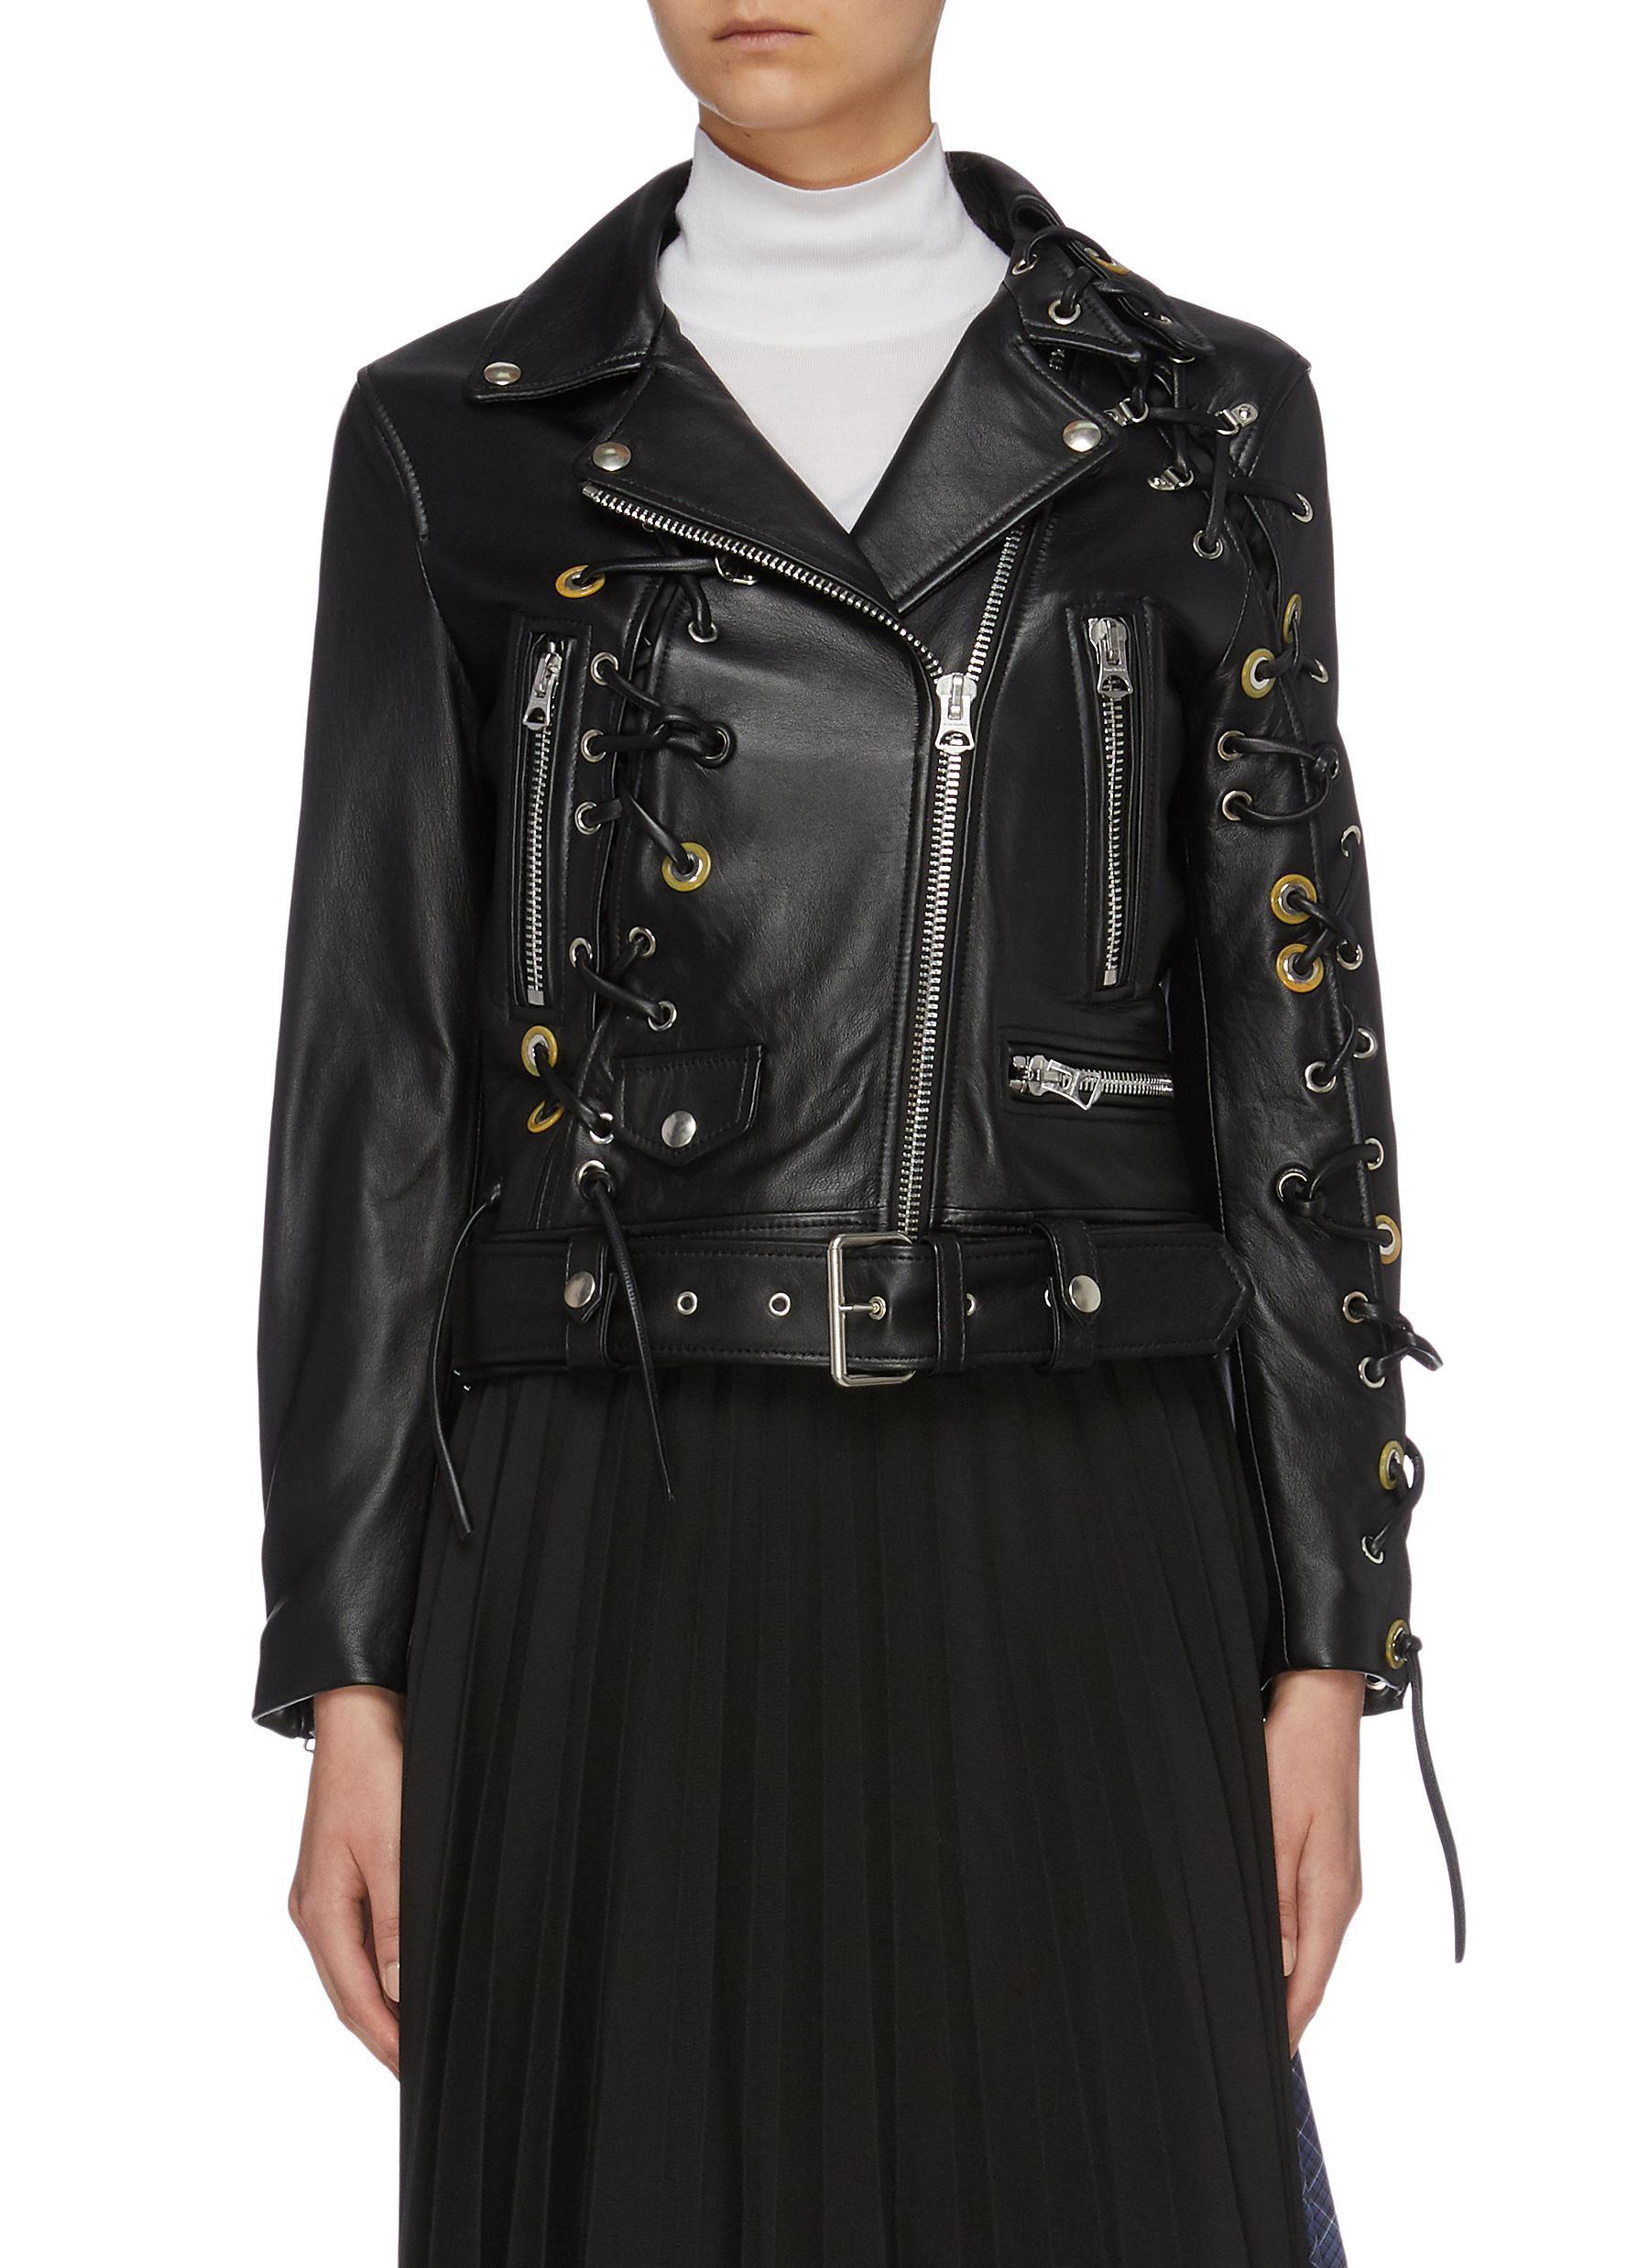 Belted lace-up eyelet embellished leather biker jacket by Acne Studios